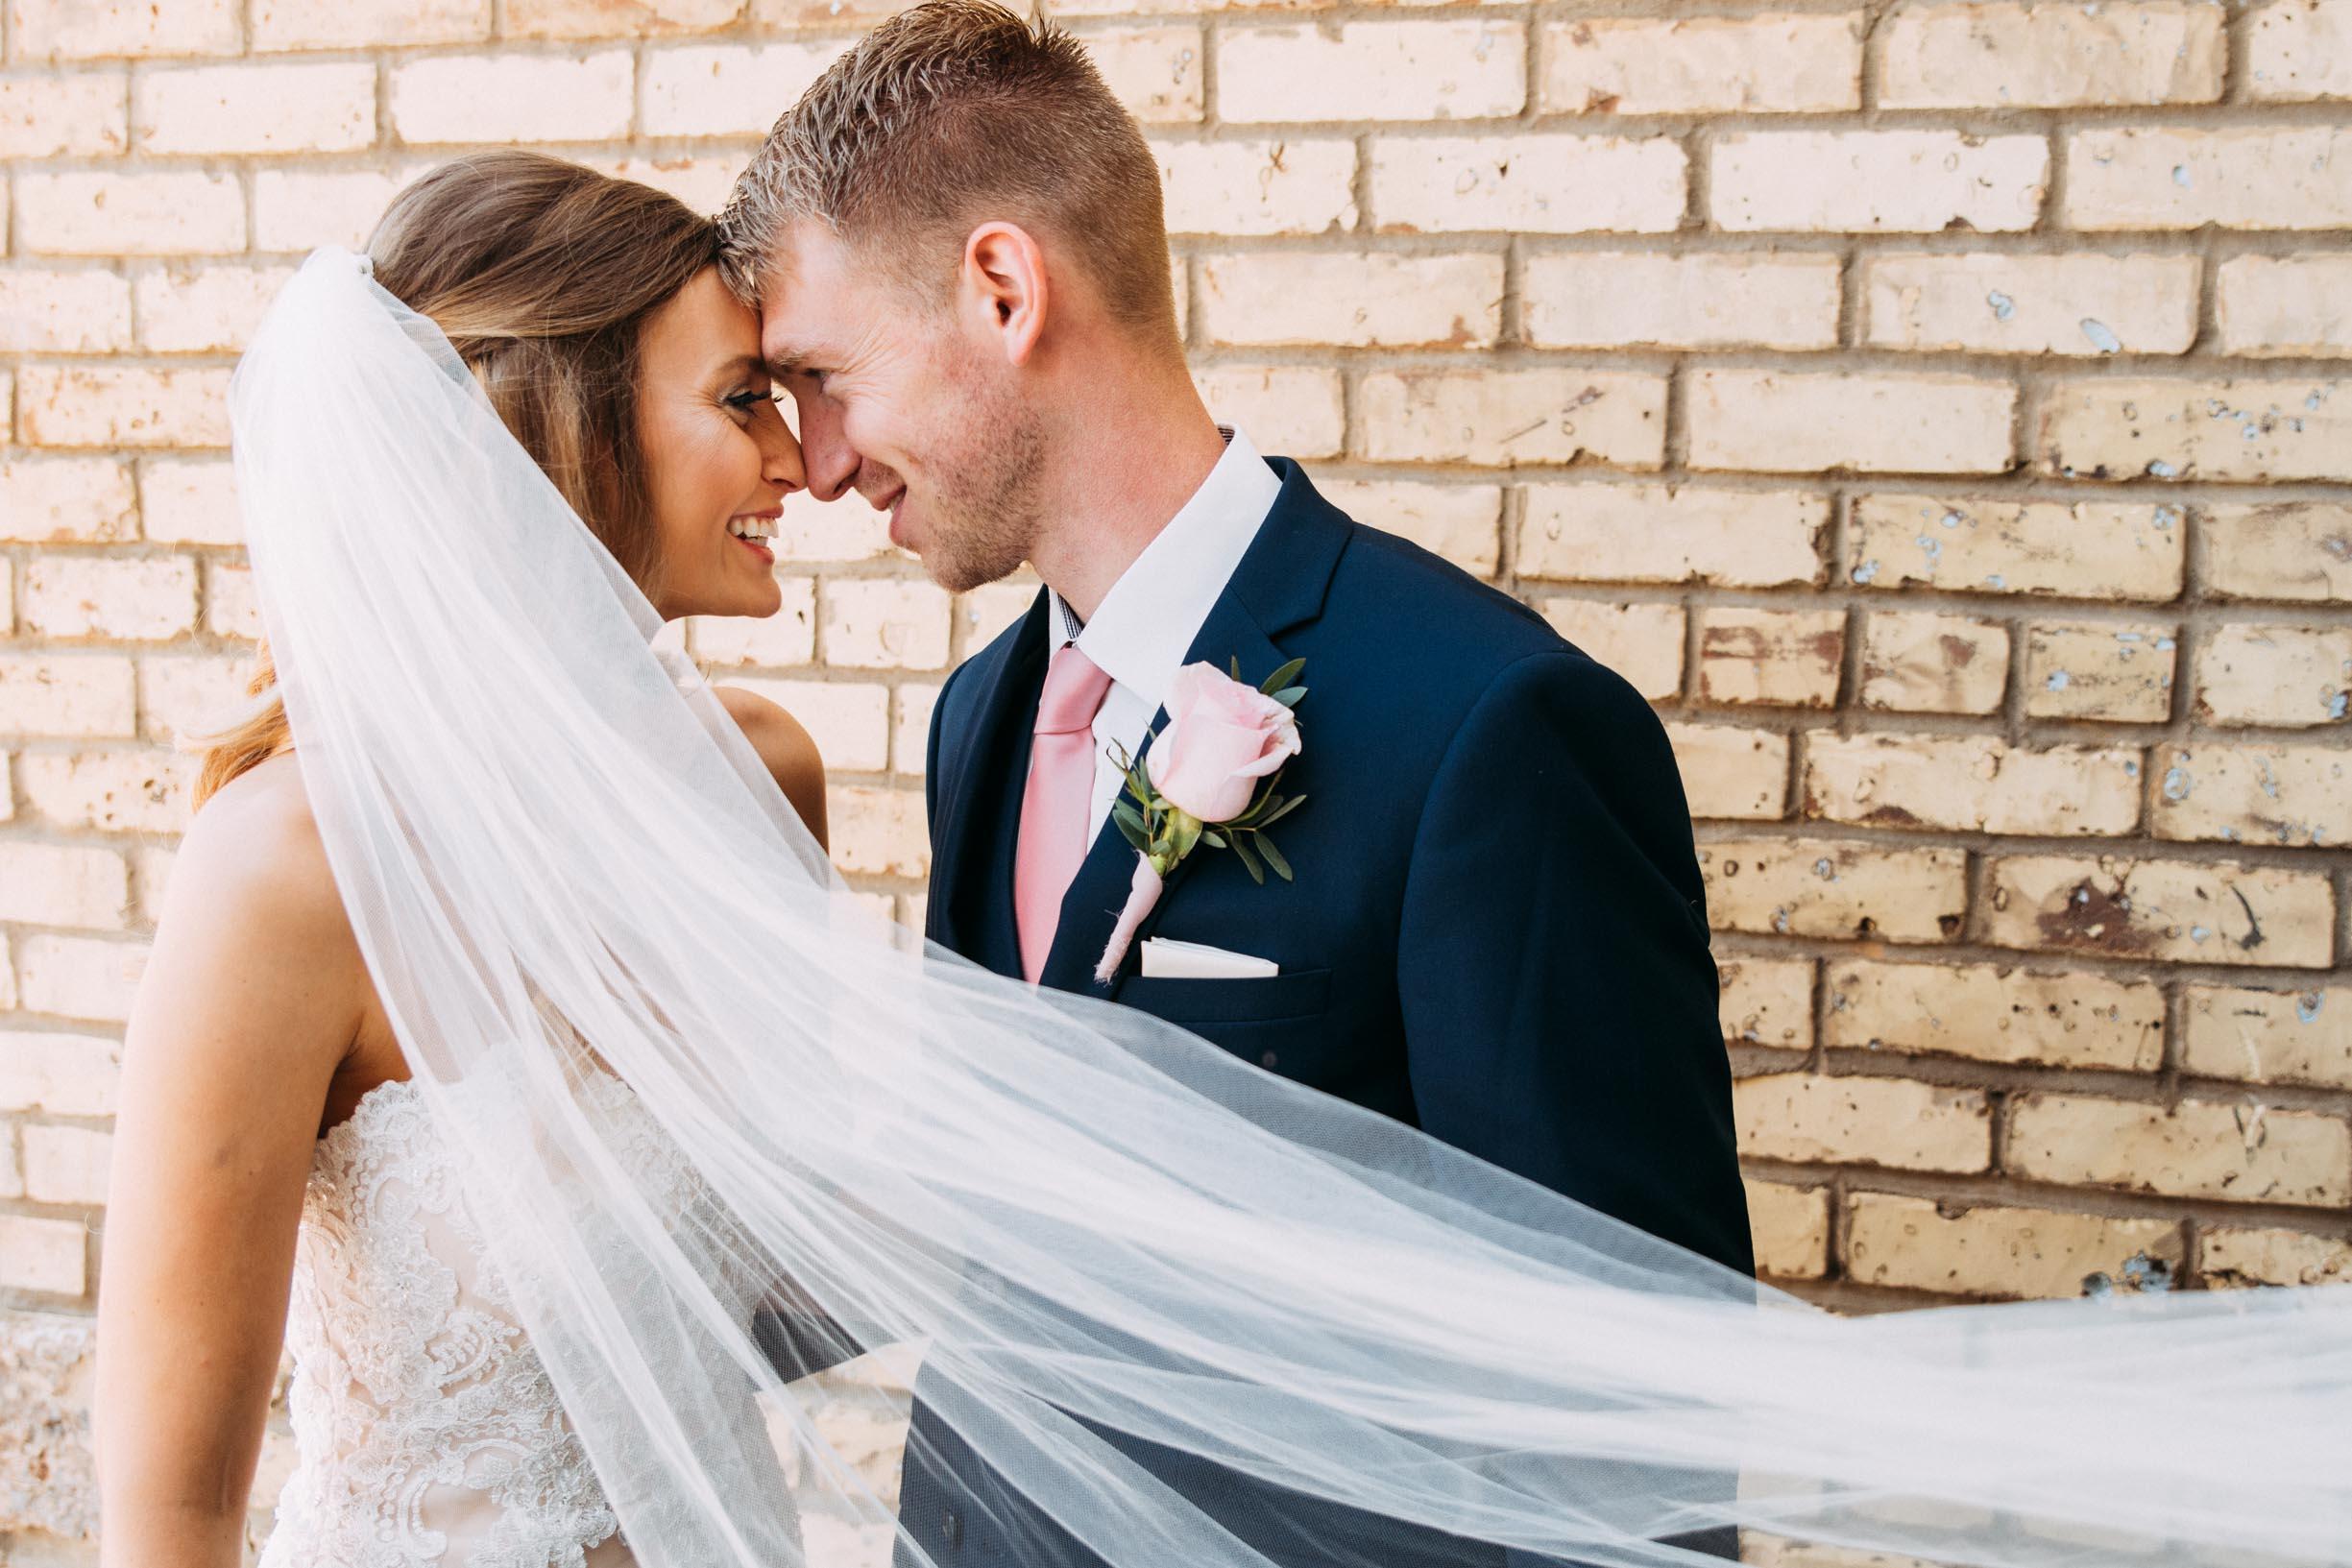 21-WeddingsattheBroz_Minnesota_WeddingBlog.jpg